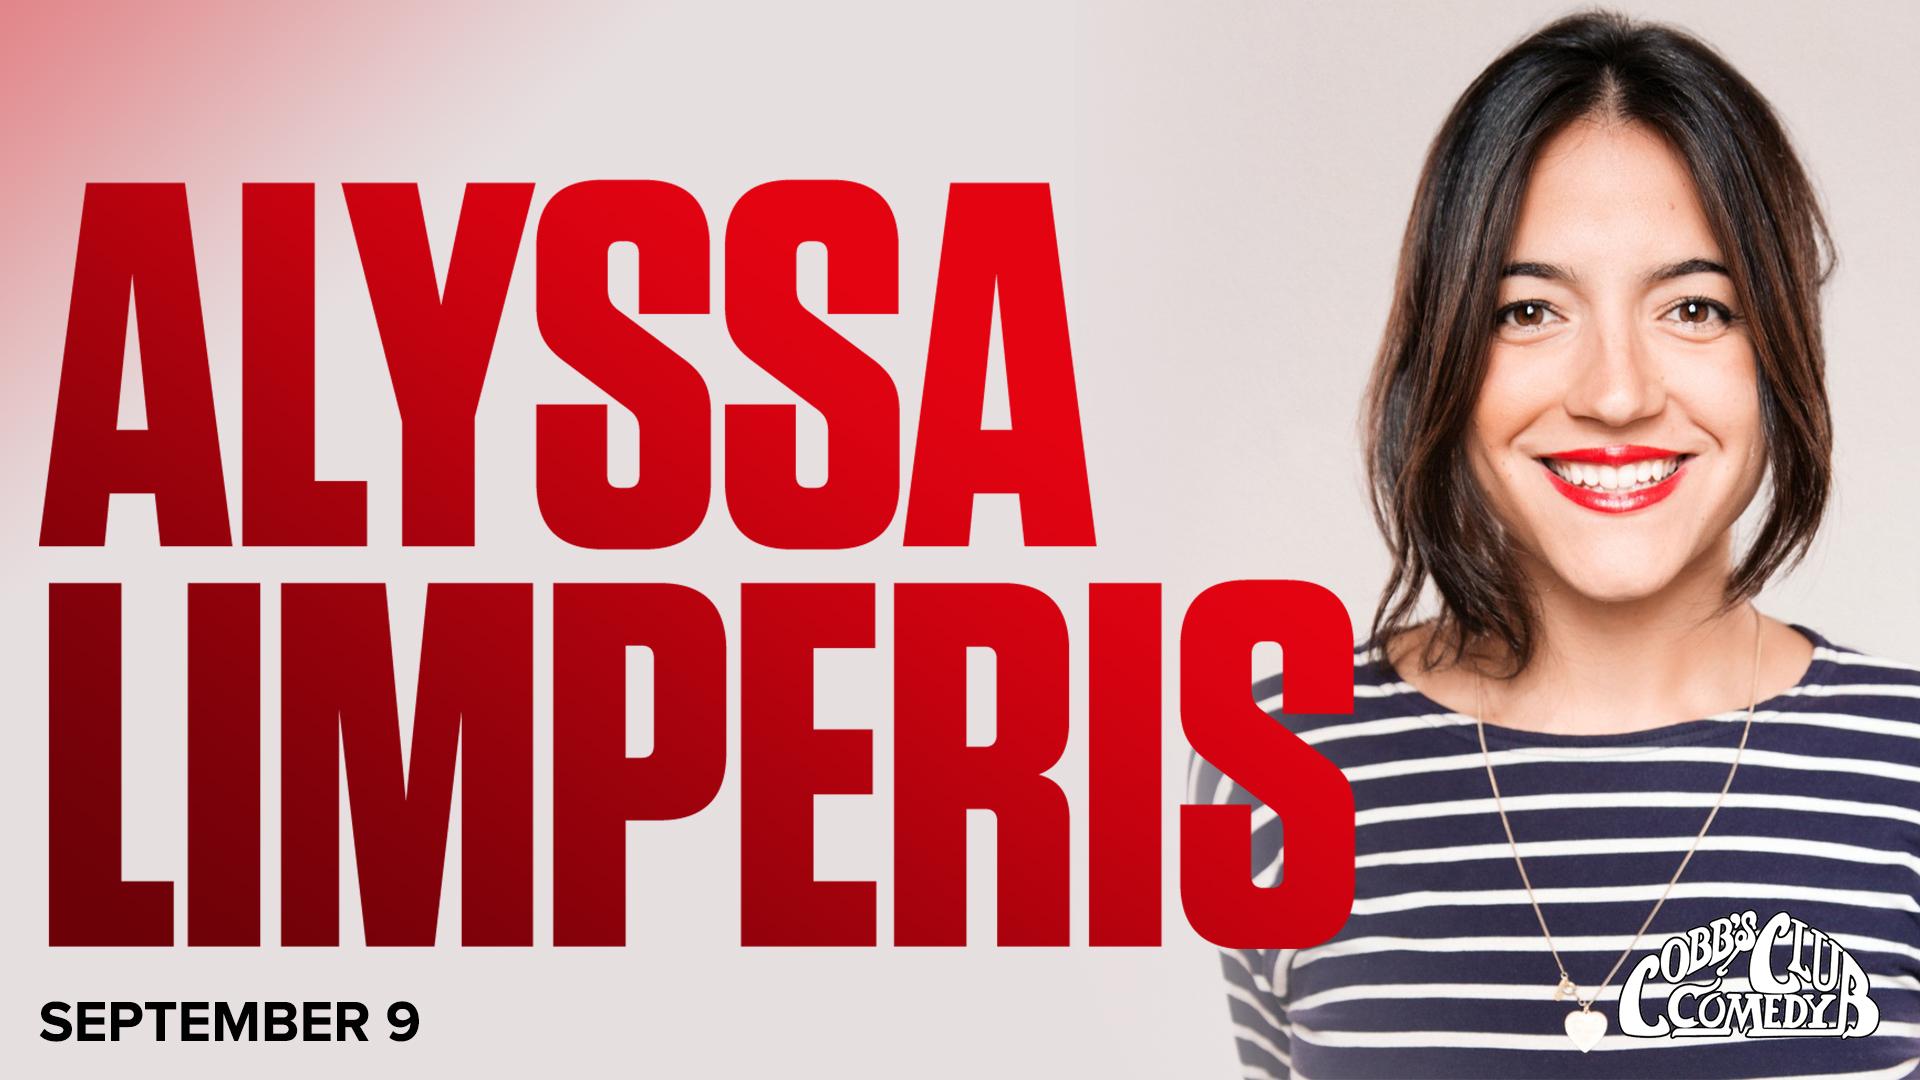 Alyssa Limperis